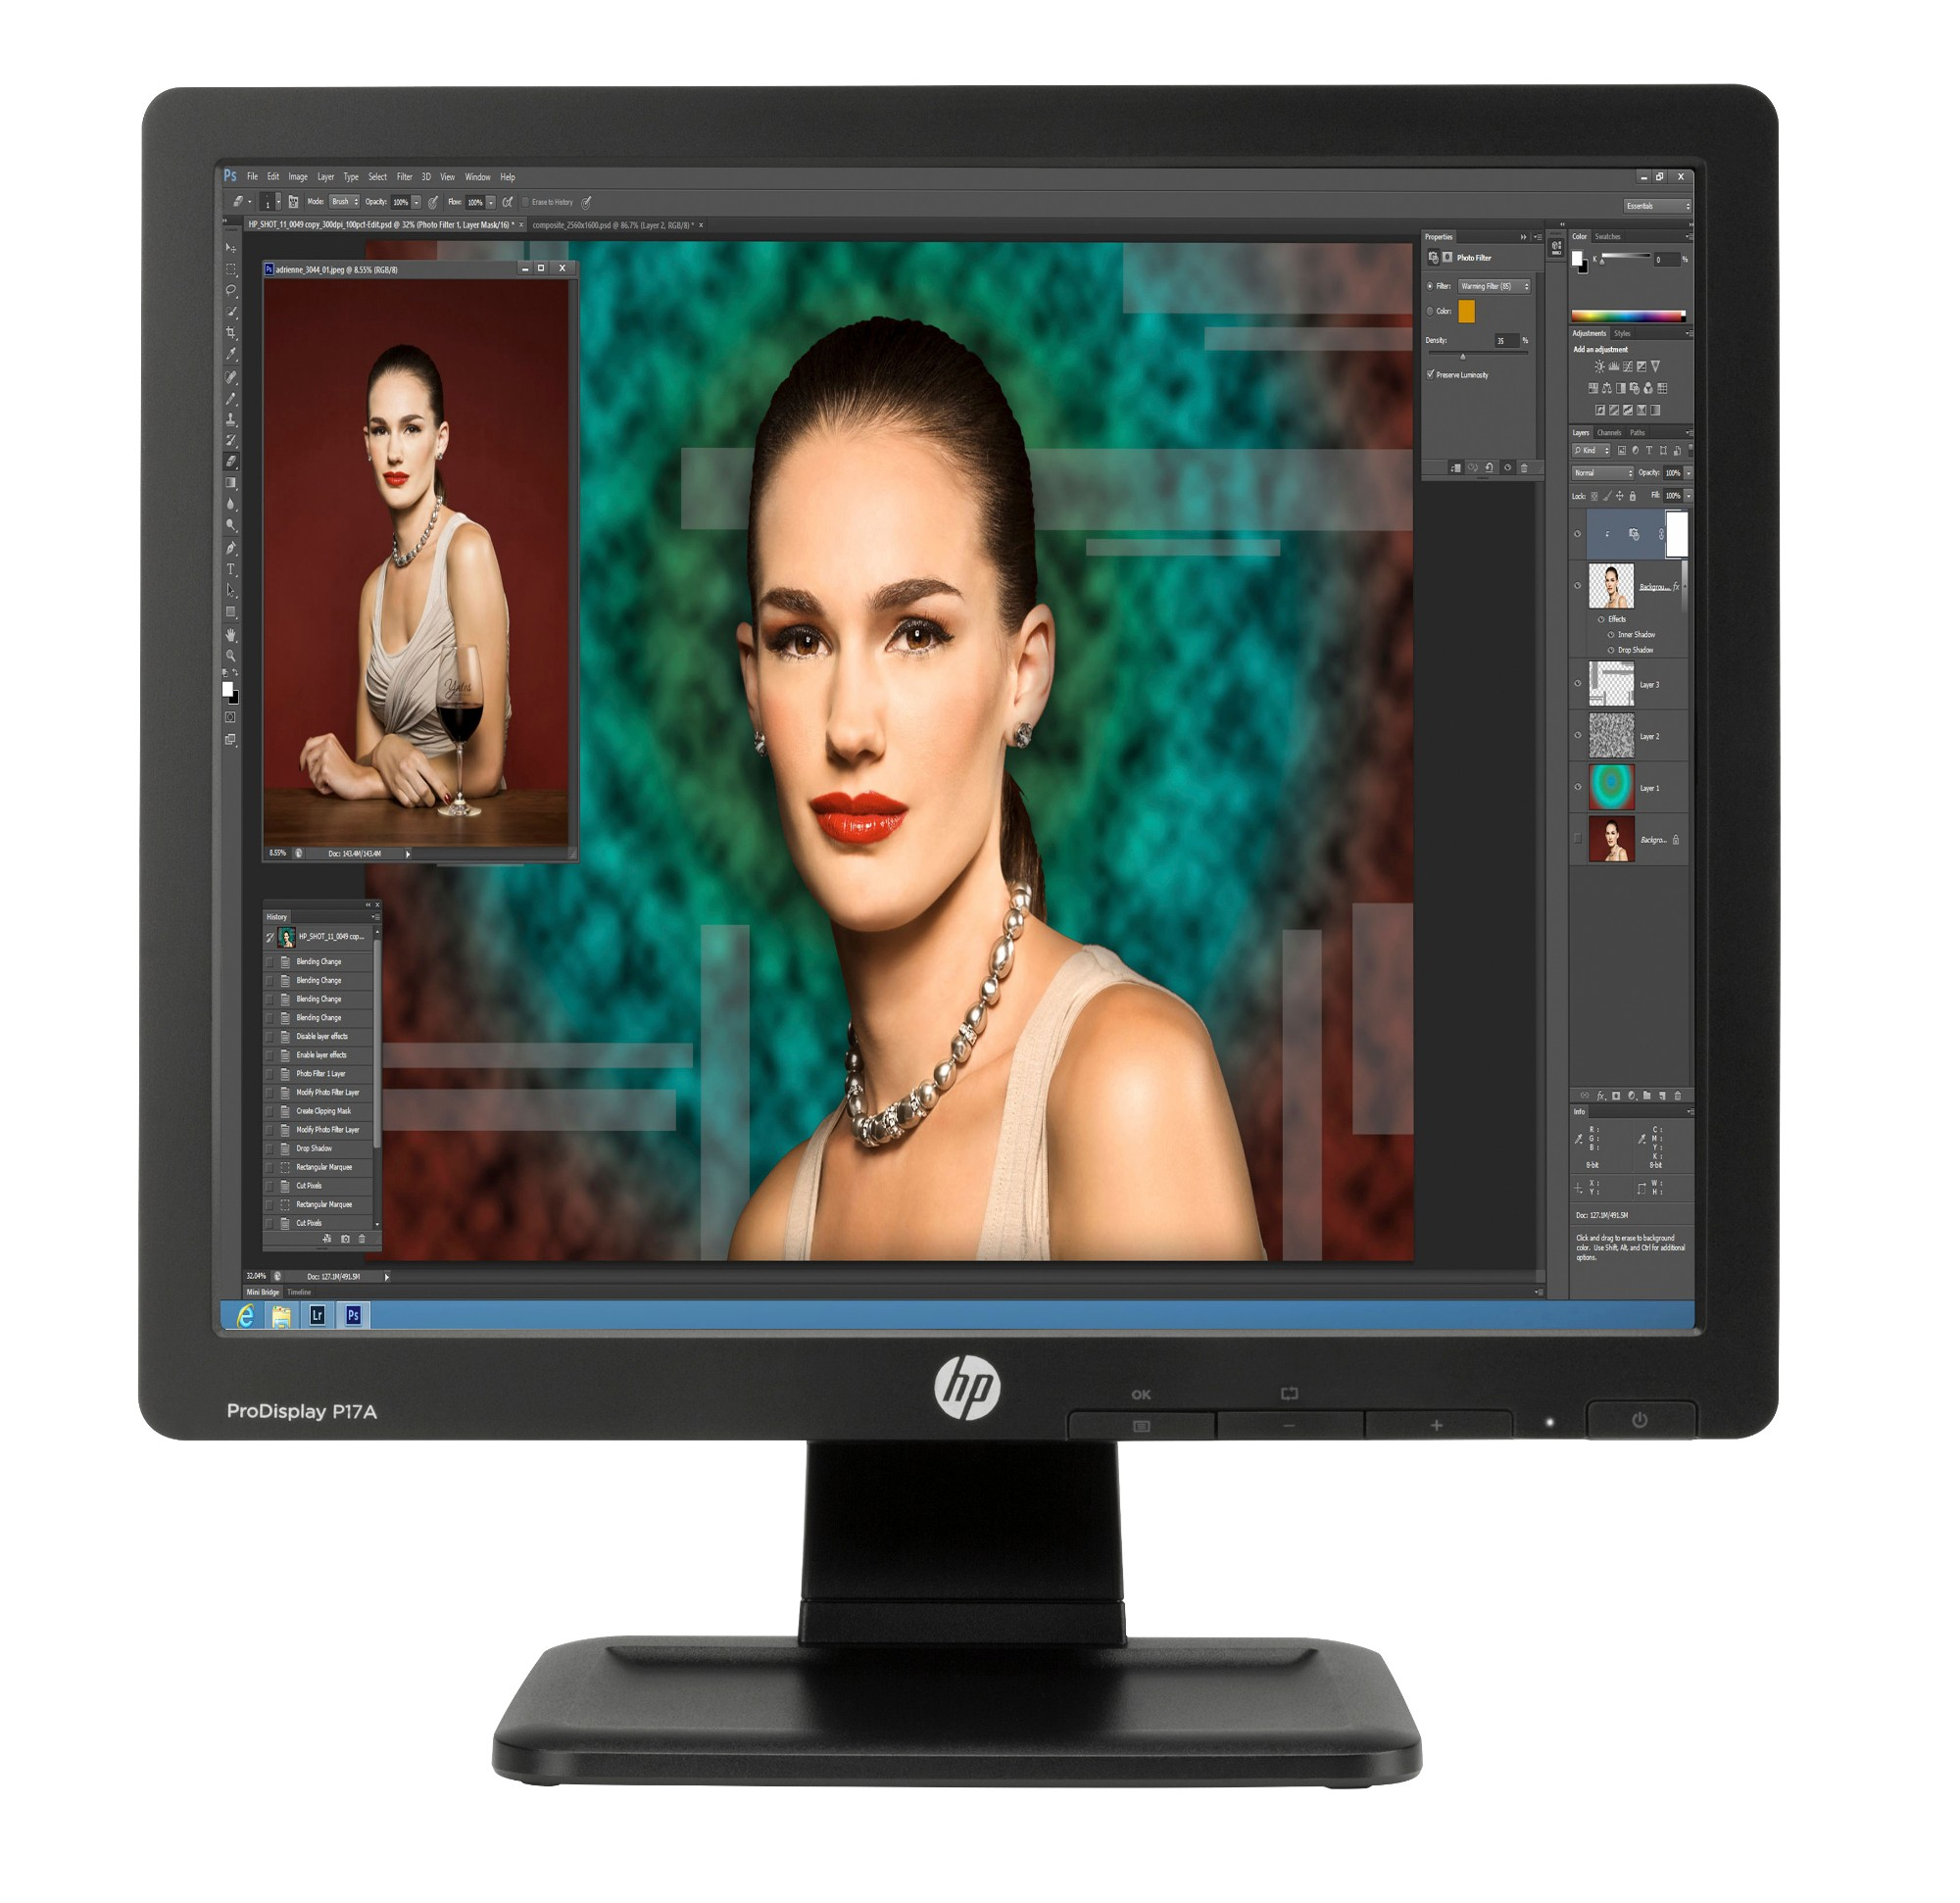 Desktop Monitor - ProDisplay P17A - 17in - 1280x1024 (SXGA)